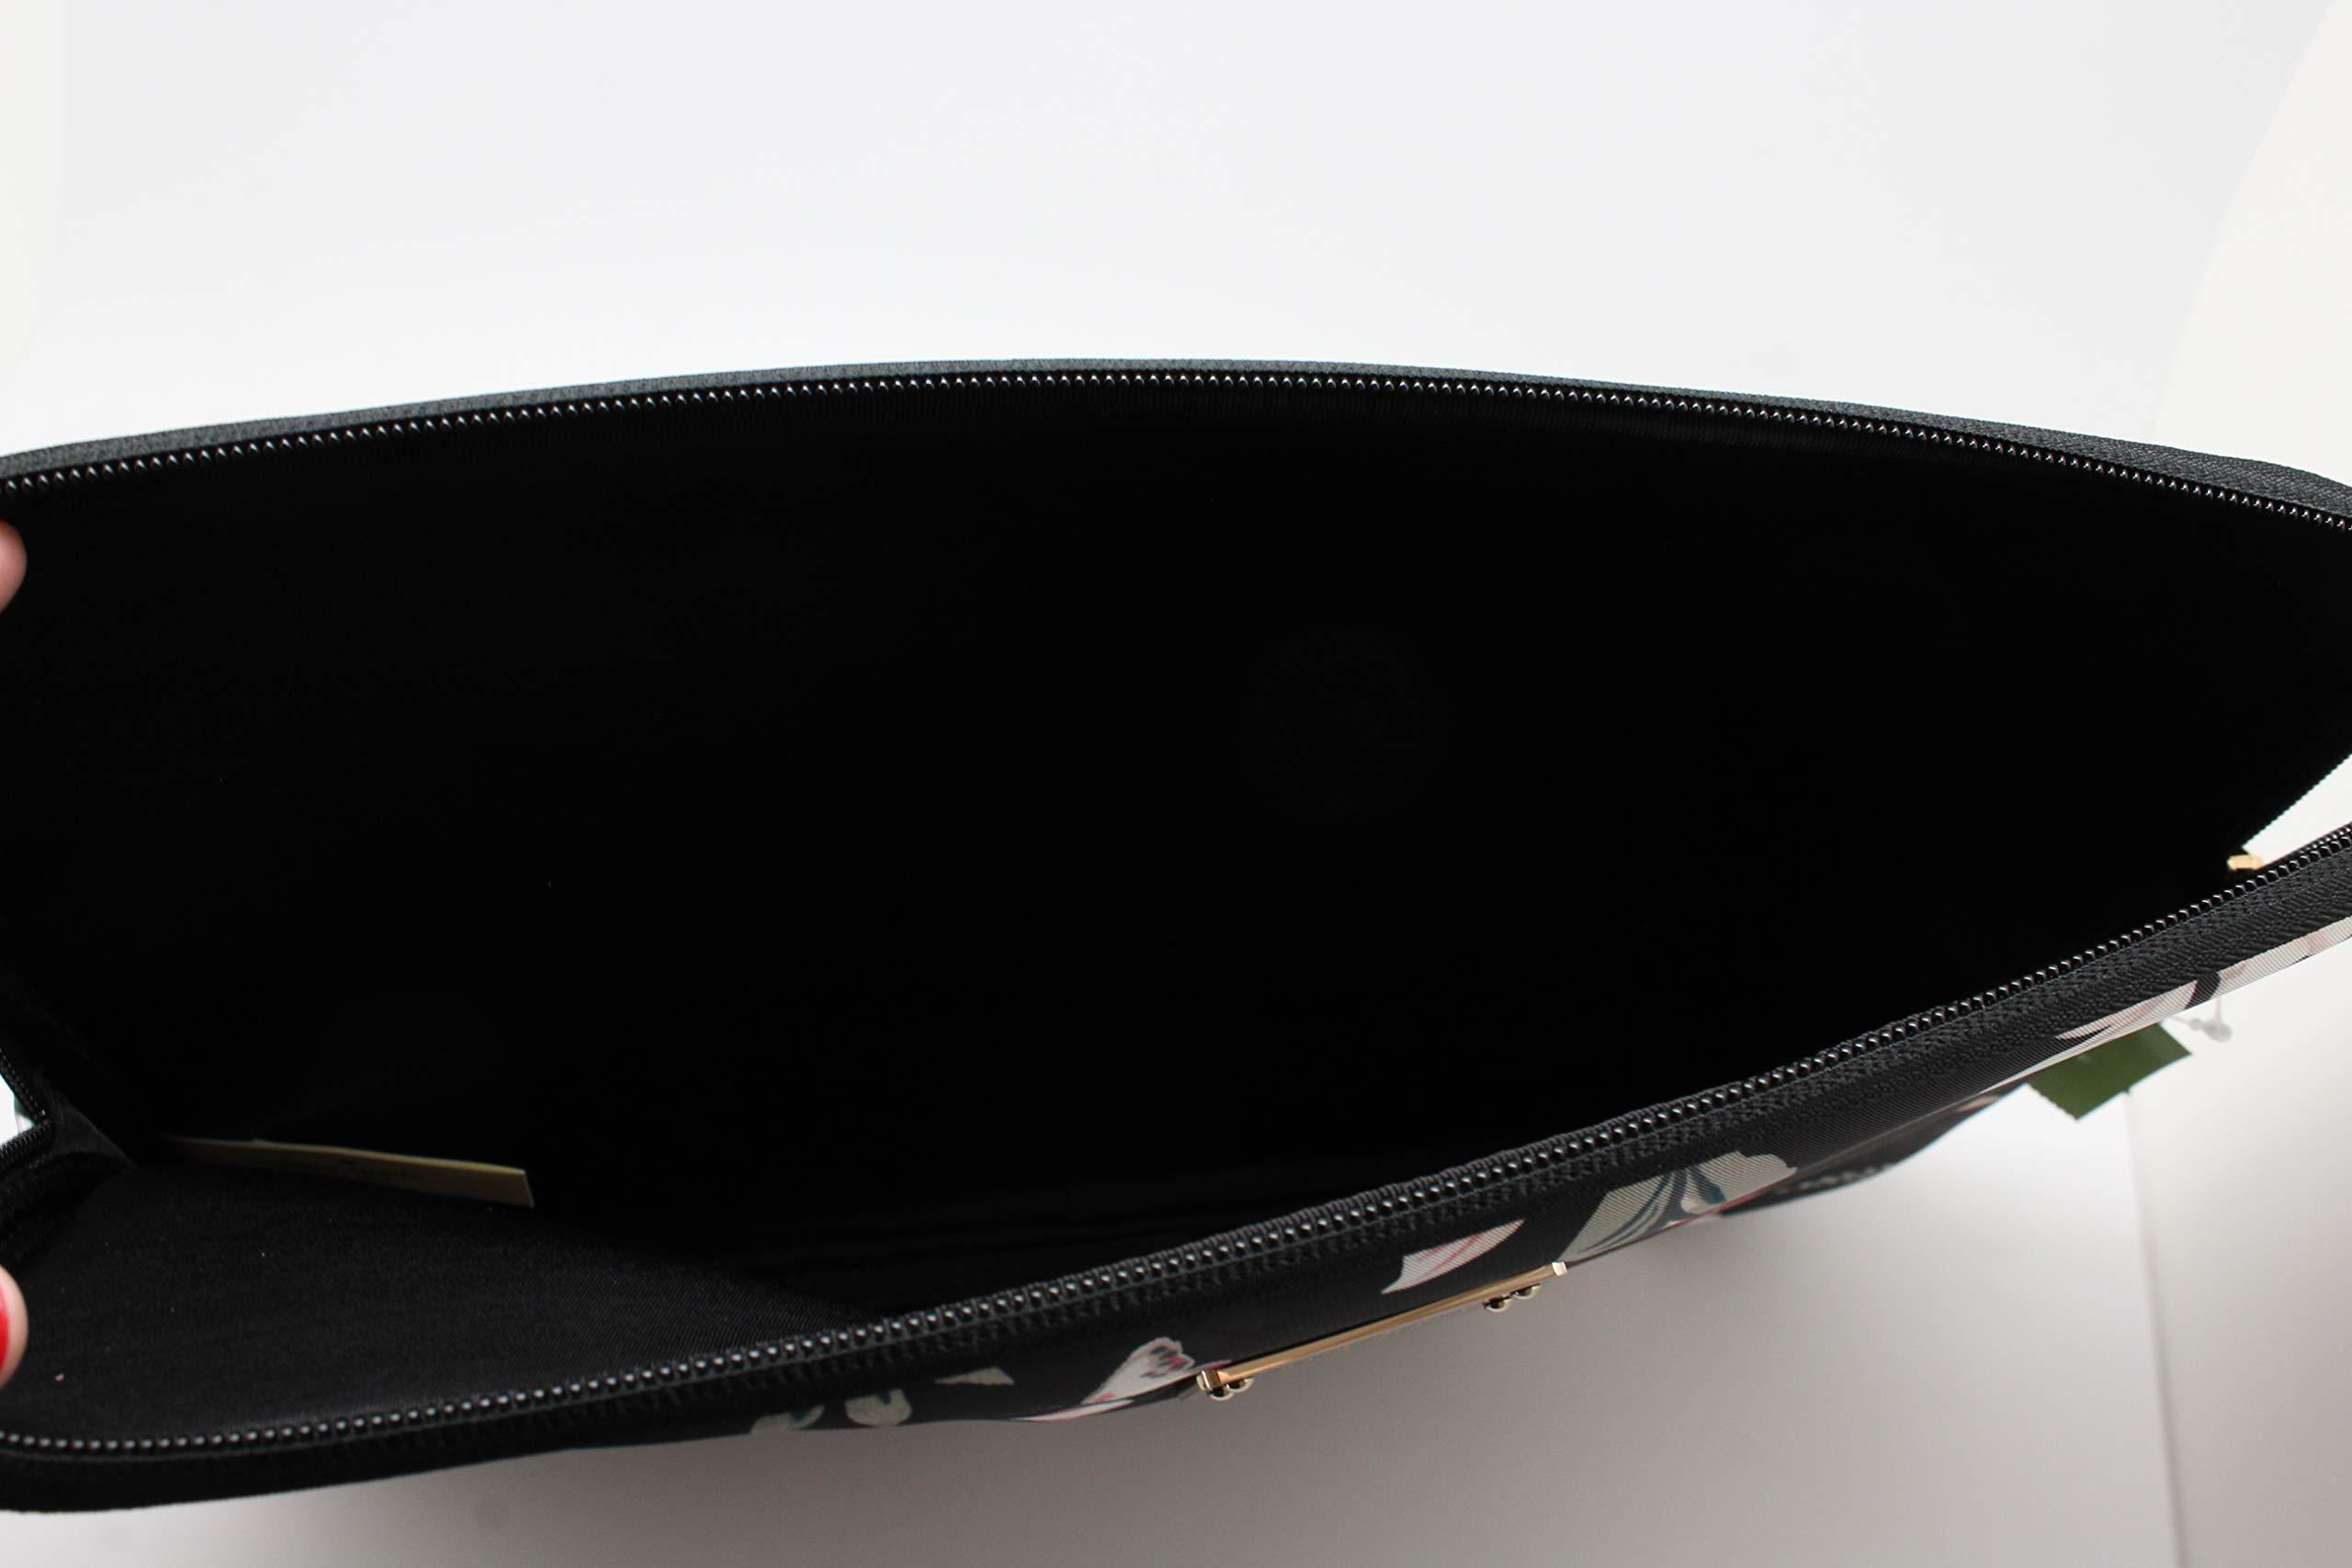 Kate Spade Wilson Rd Botanical Laptop Case Sleeve Black Multi 13'' by Kate Spade New York (Image #7)